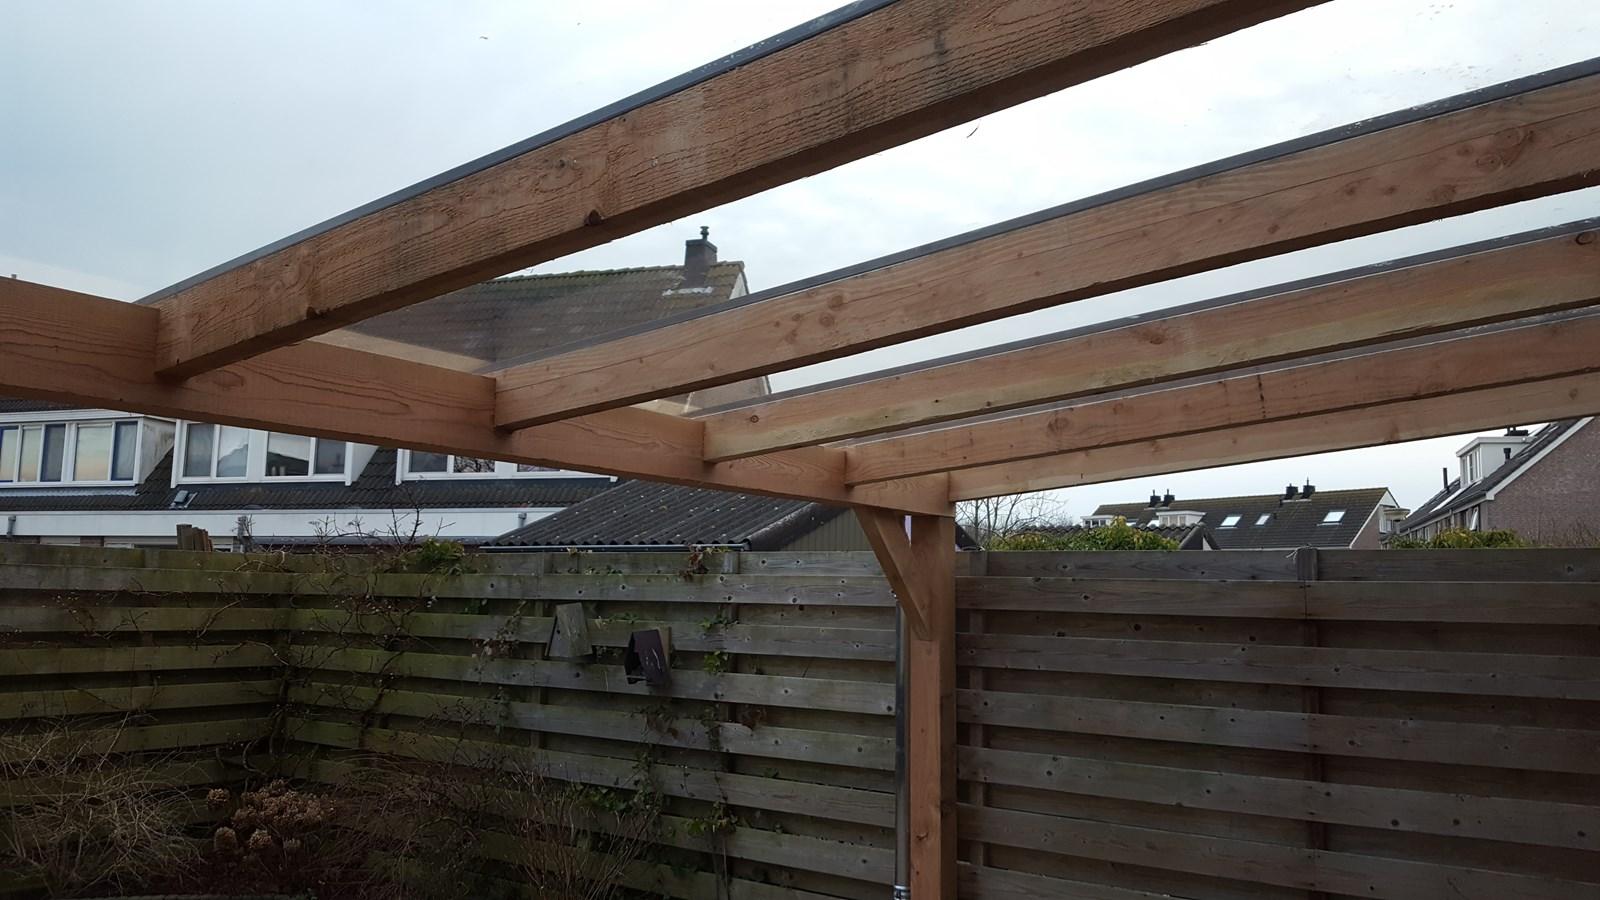 Douglas houten overkapping met glazen dak bergveranda.nl